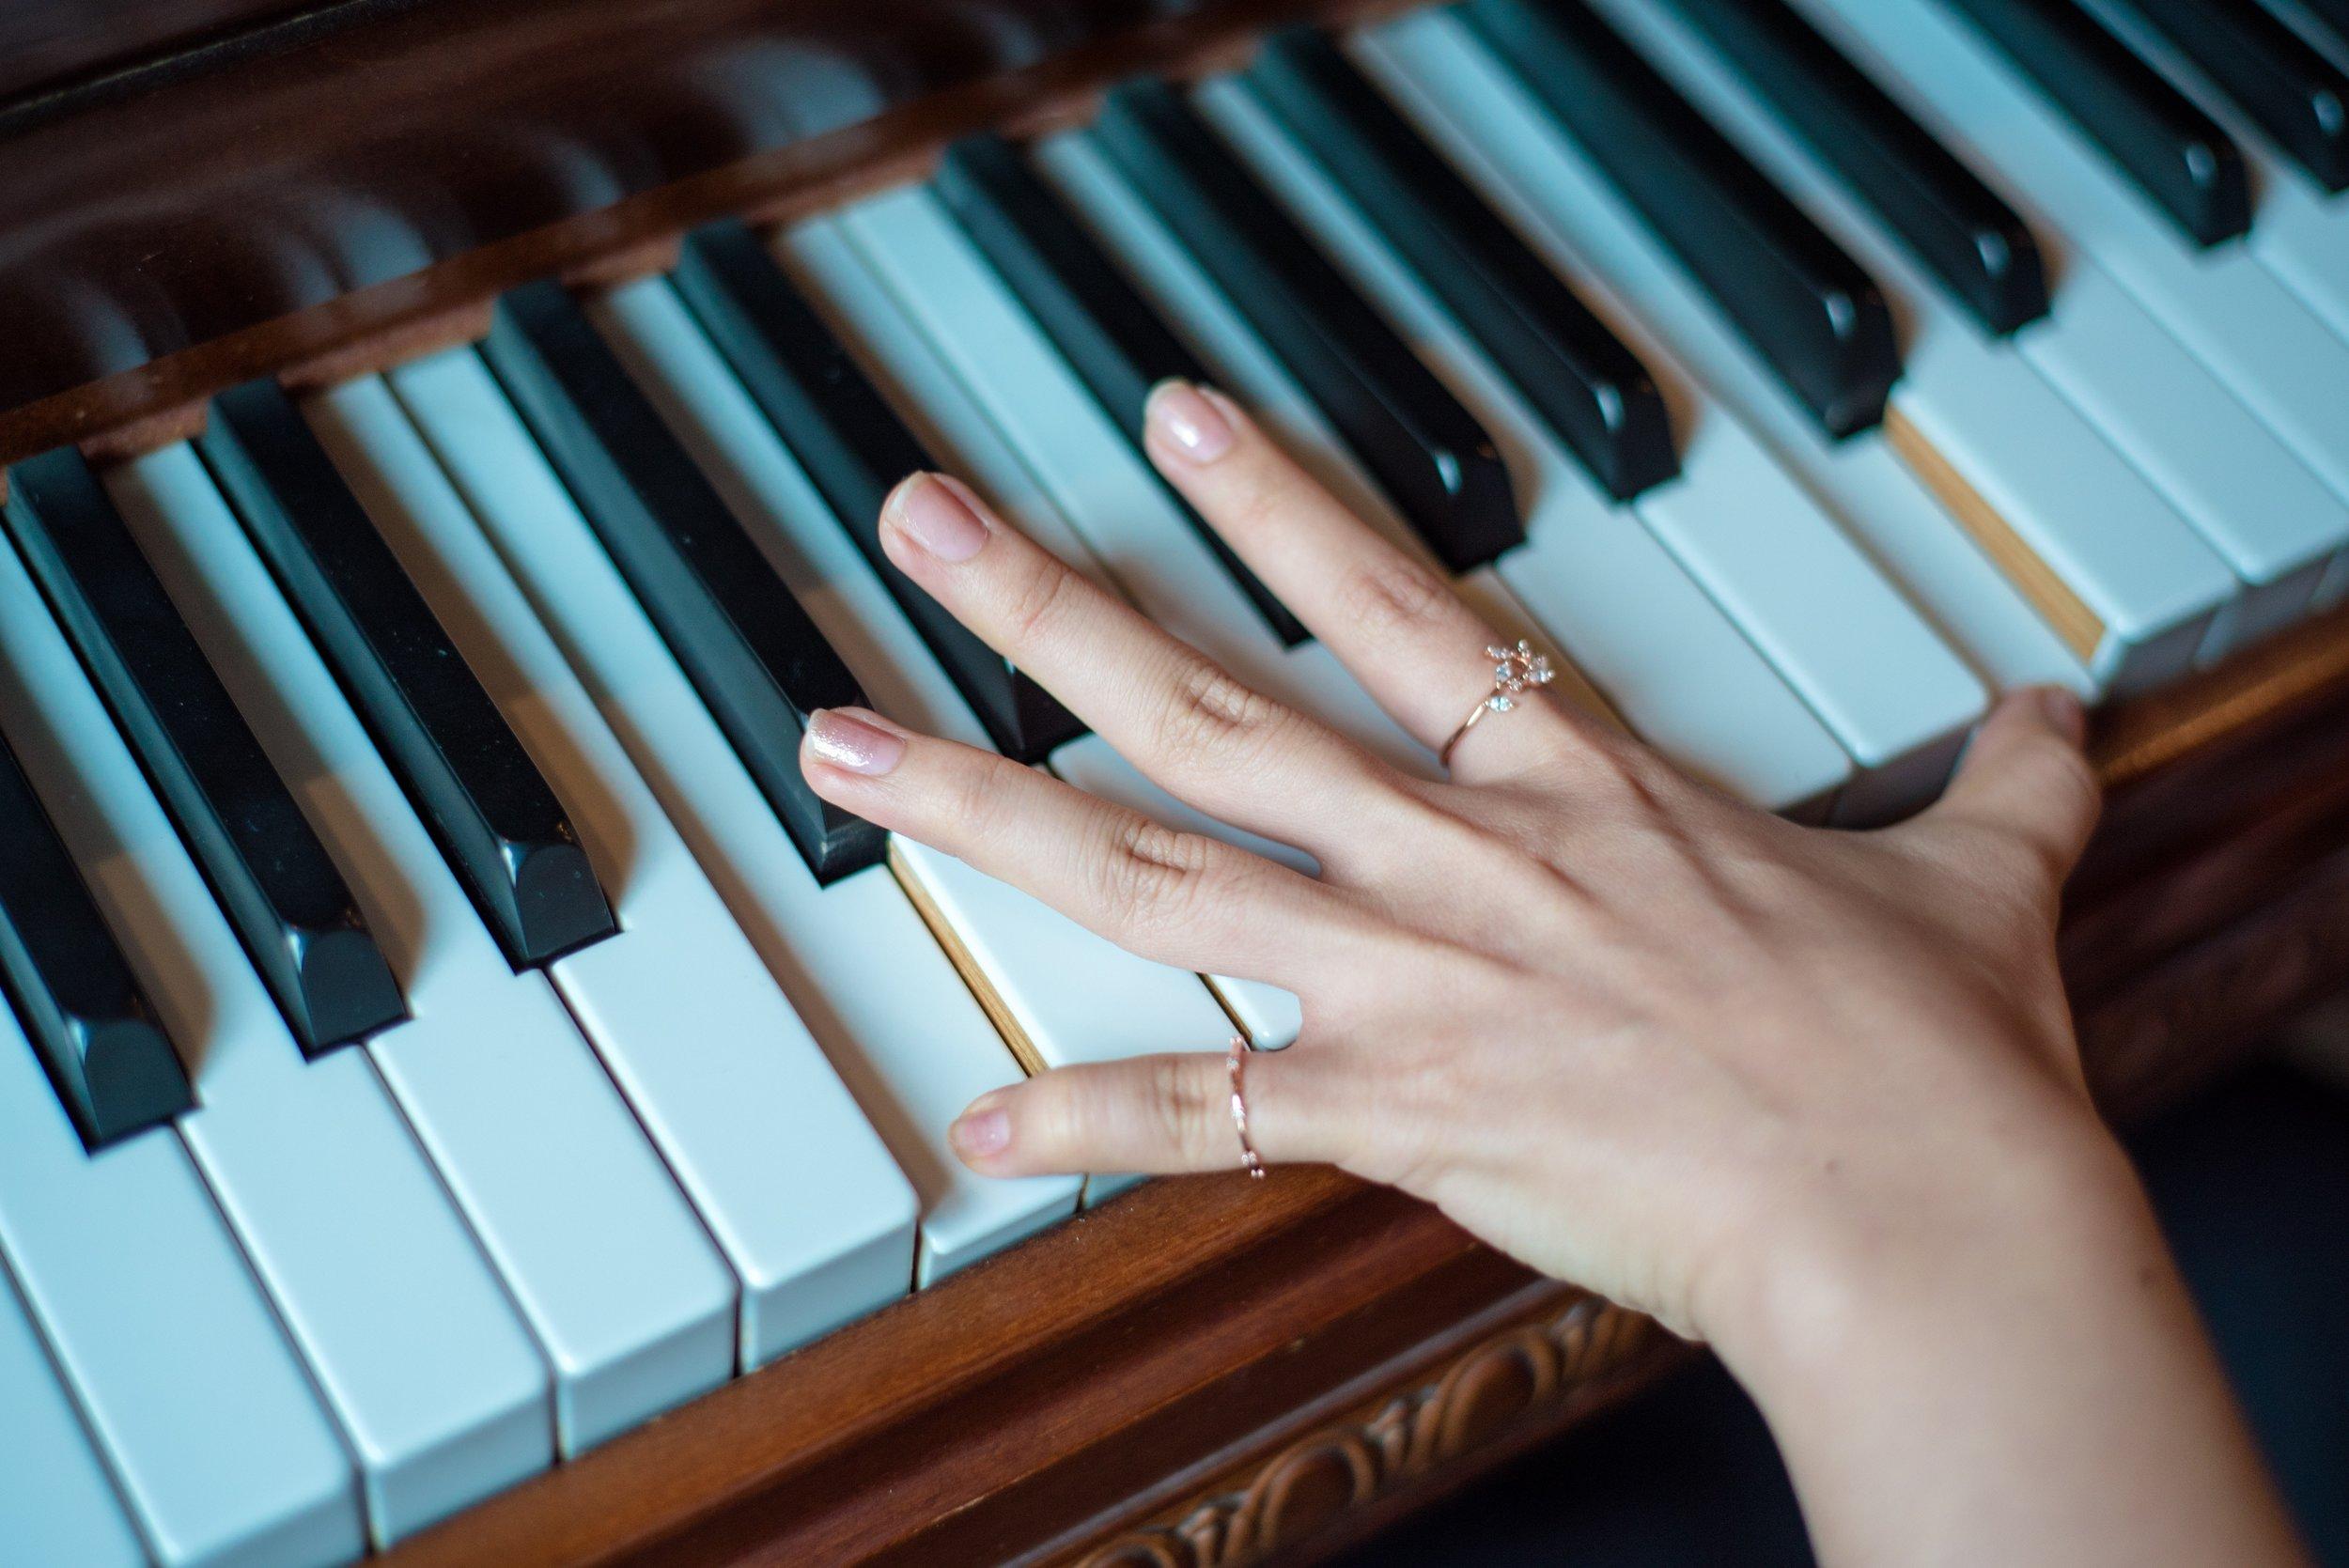 chord-fingers-hand-164737.jpg